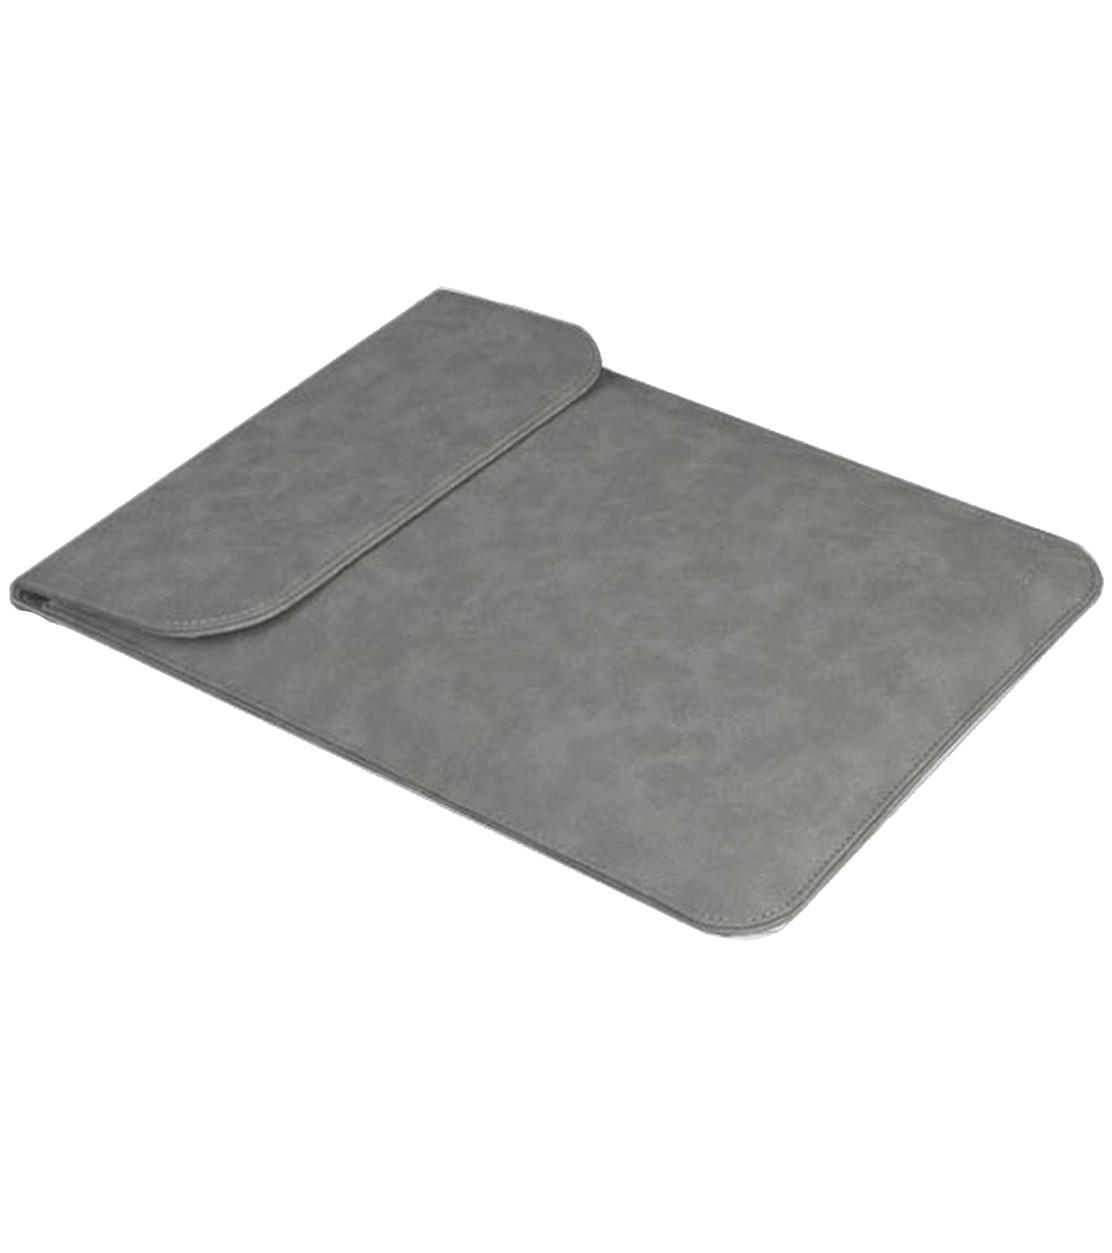 Husa de protectie si transport laptop iUni L20, Slim Magnetic, 15 inch, Gri imagine techstar.ro 2021